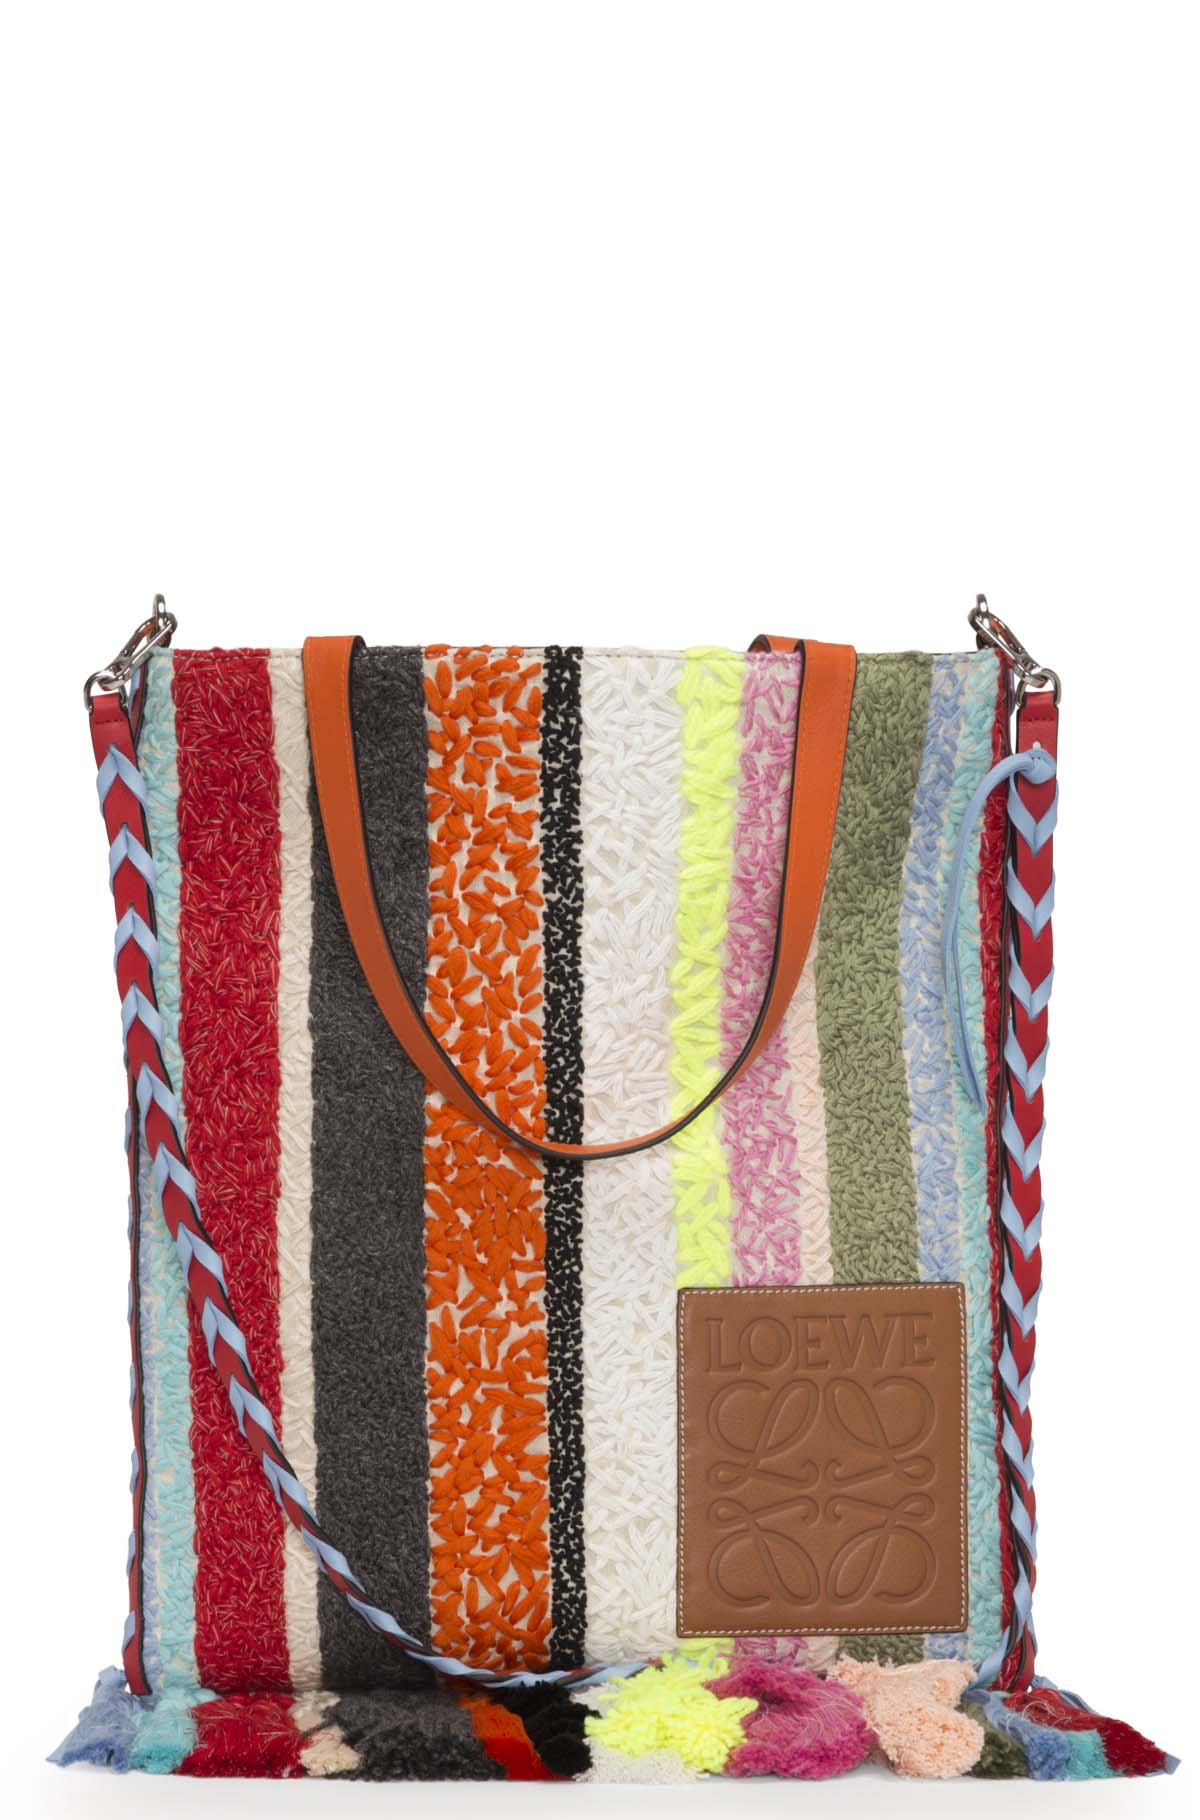 LOEWE Vertical Tote Stripes Bag Multicolor front